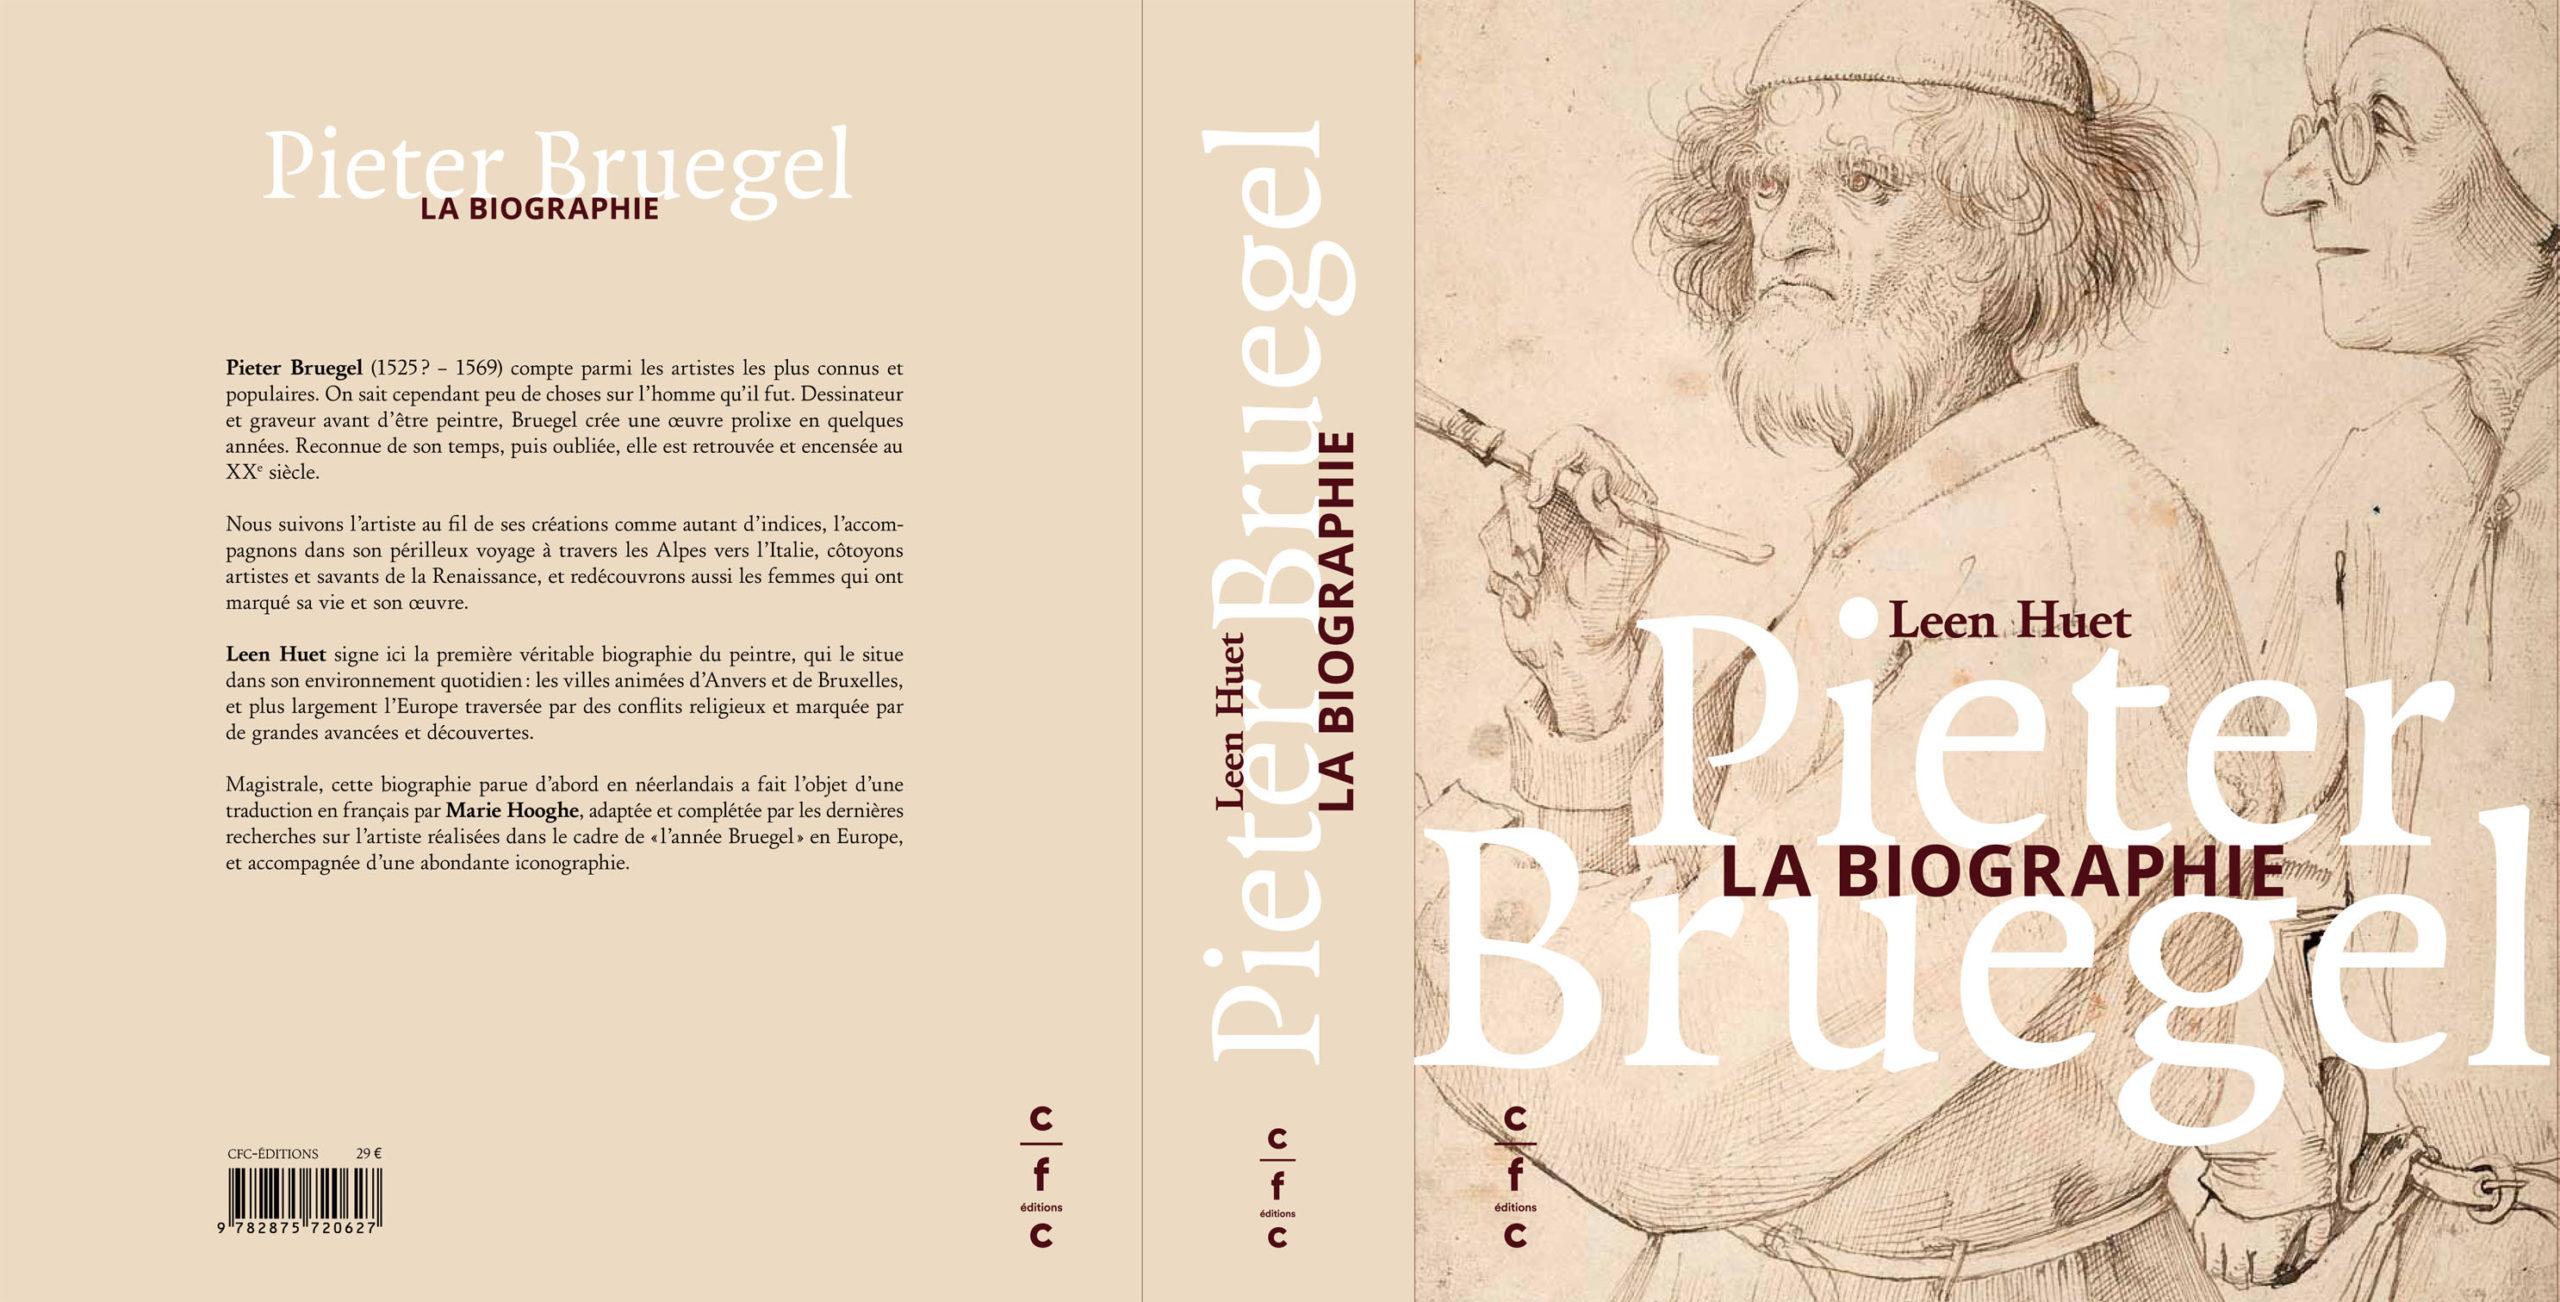 Couverture Leen Huet, Pieter Bruegel. La biographie